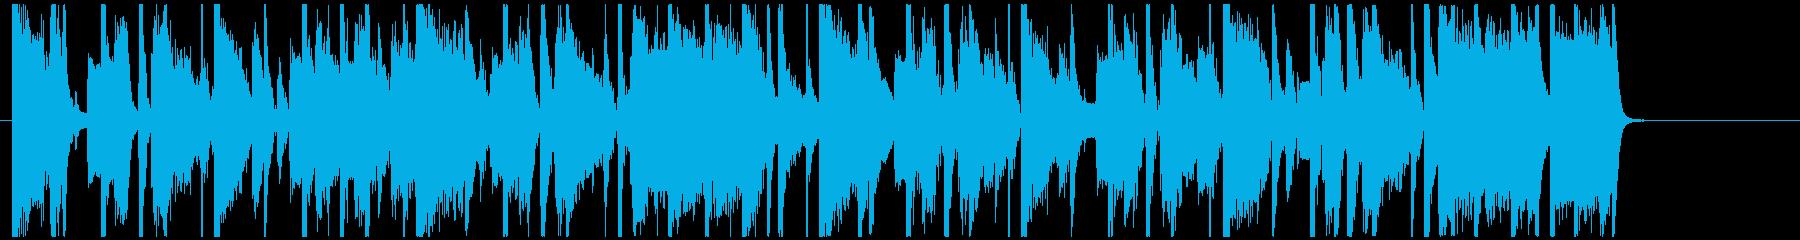 Fusion Tone BGM / Jingle's reproduced waveform